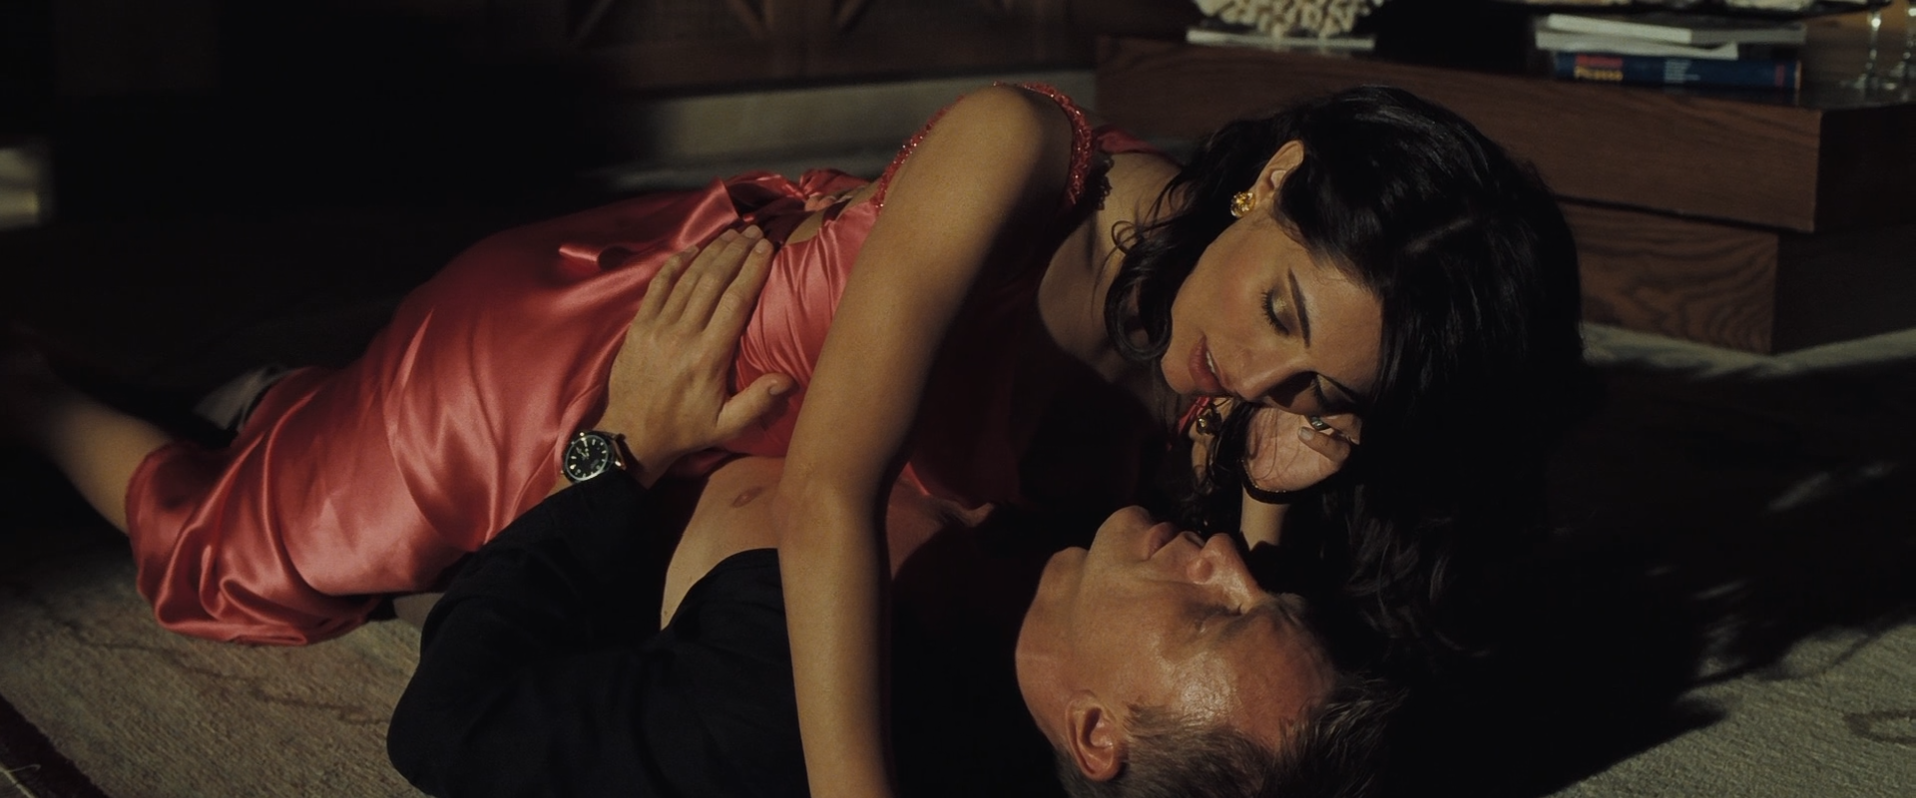 29. Solange Dimitrios (Caterina Murino)